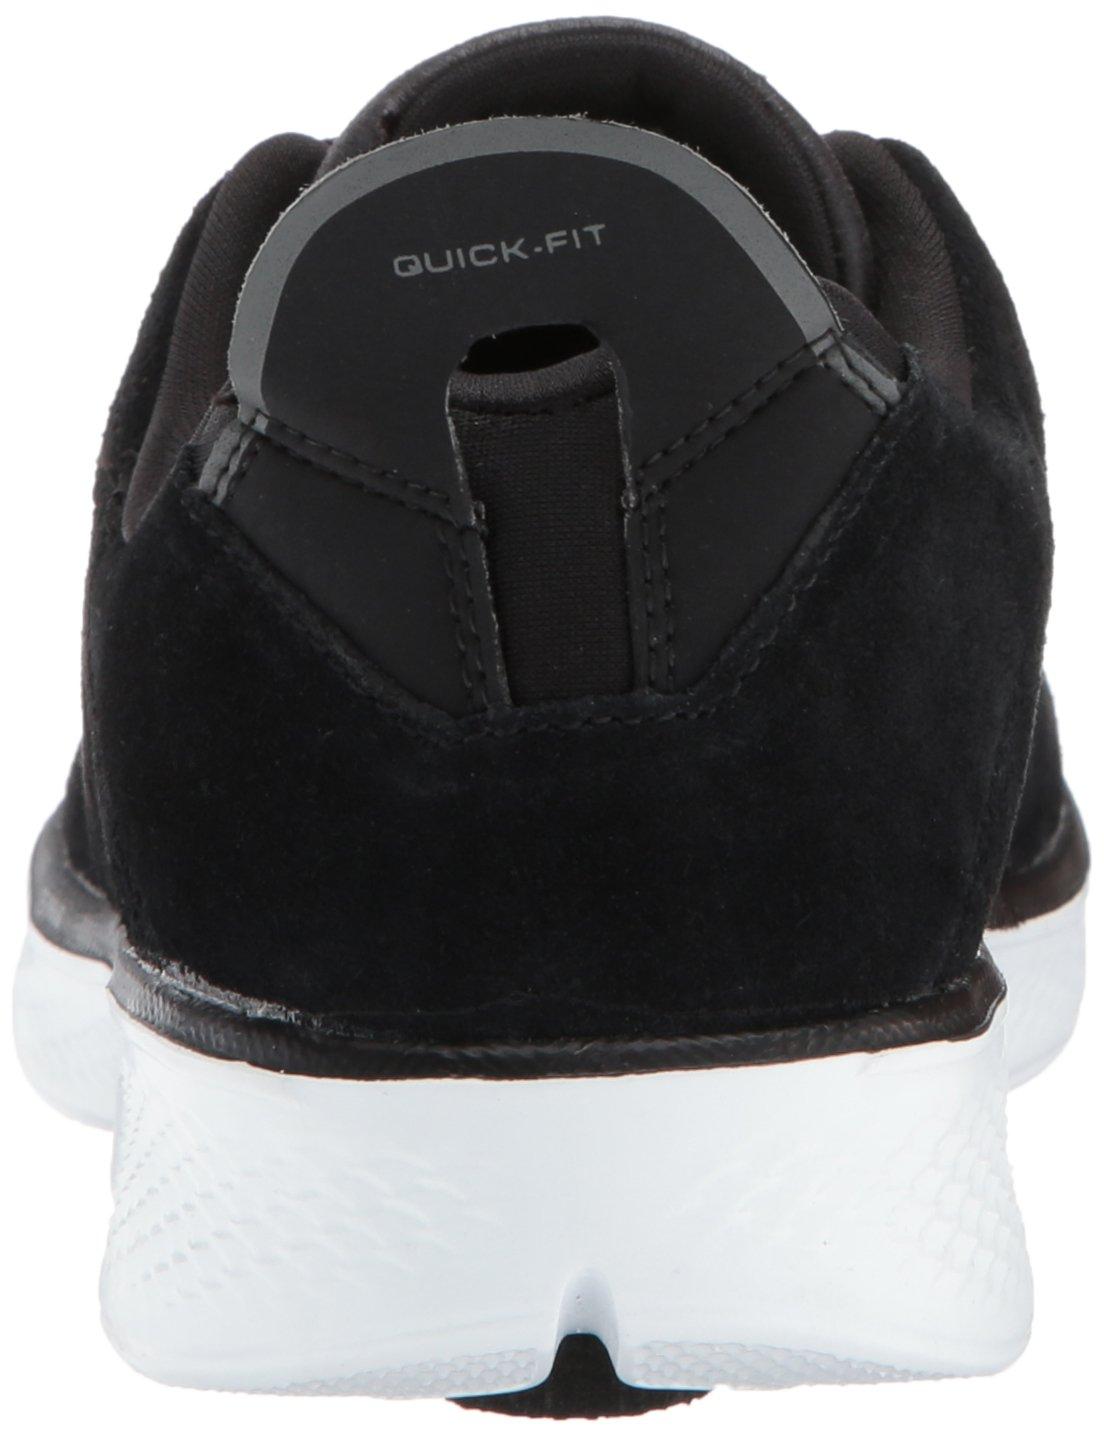 Skechers Performance Women's Go 4 Walk US Black/White Shoe B01N10YJ2K 11 B(M) US Black/White Walk 903f3f